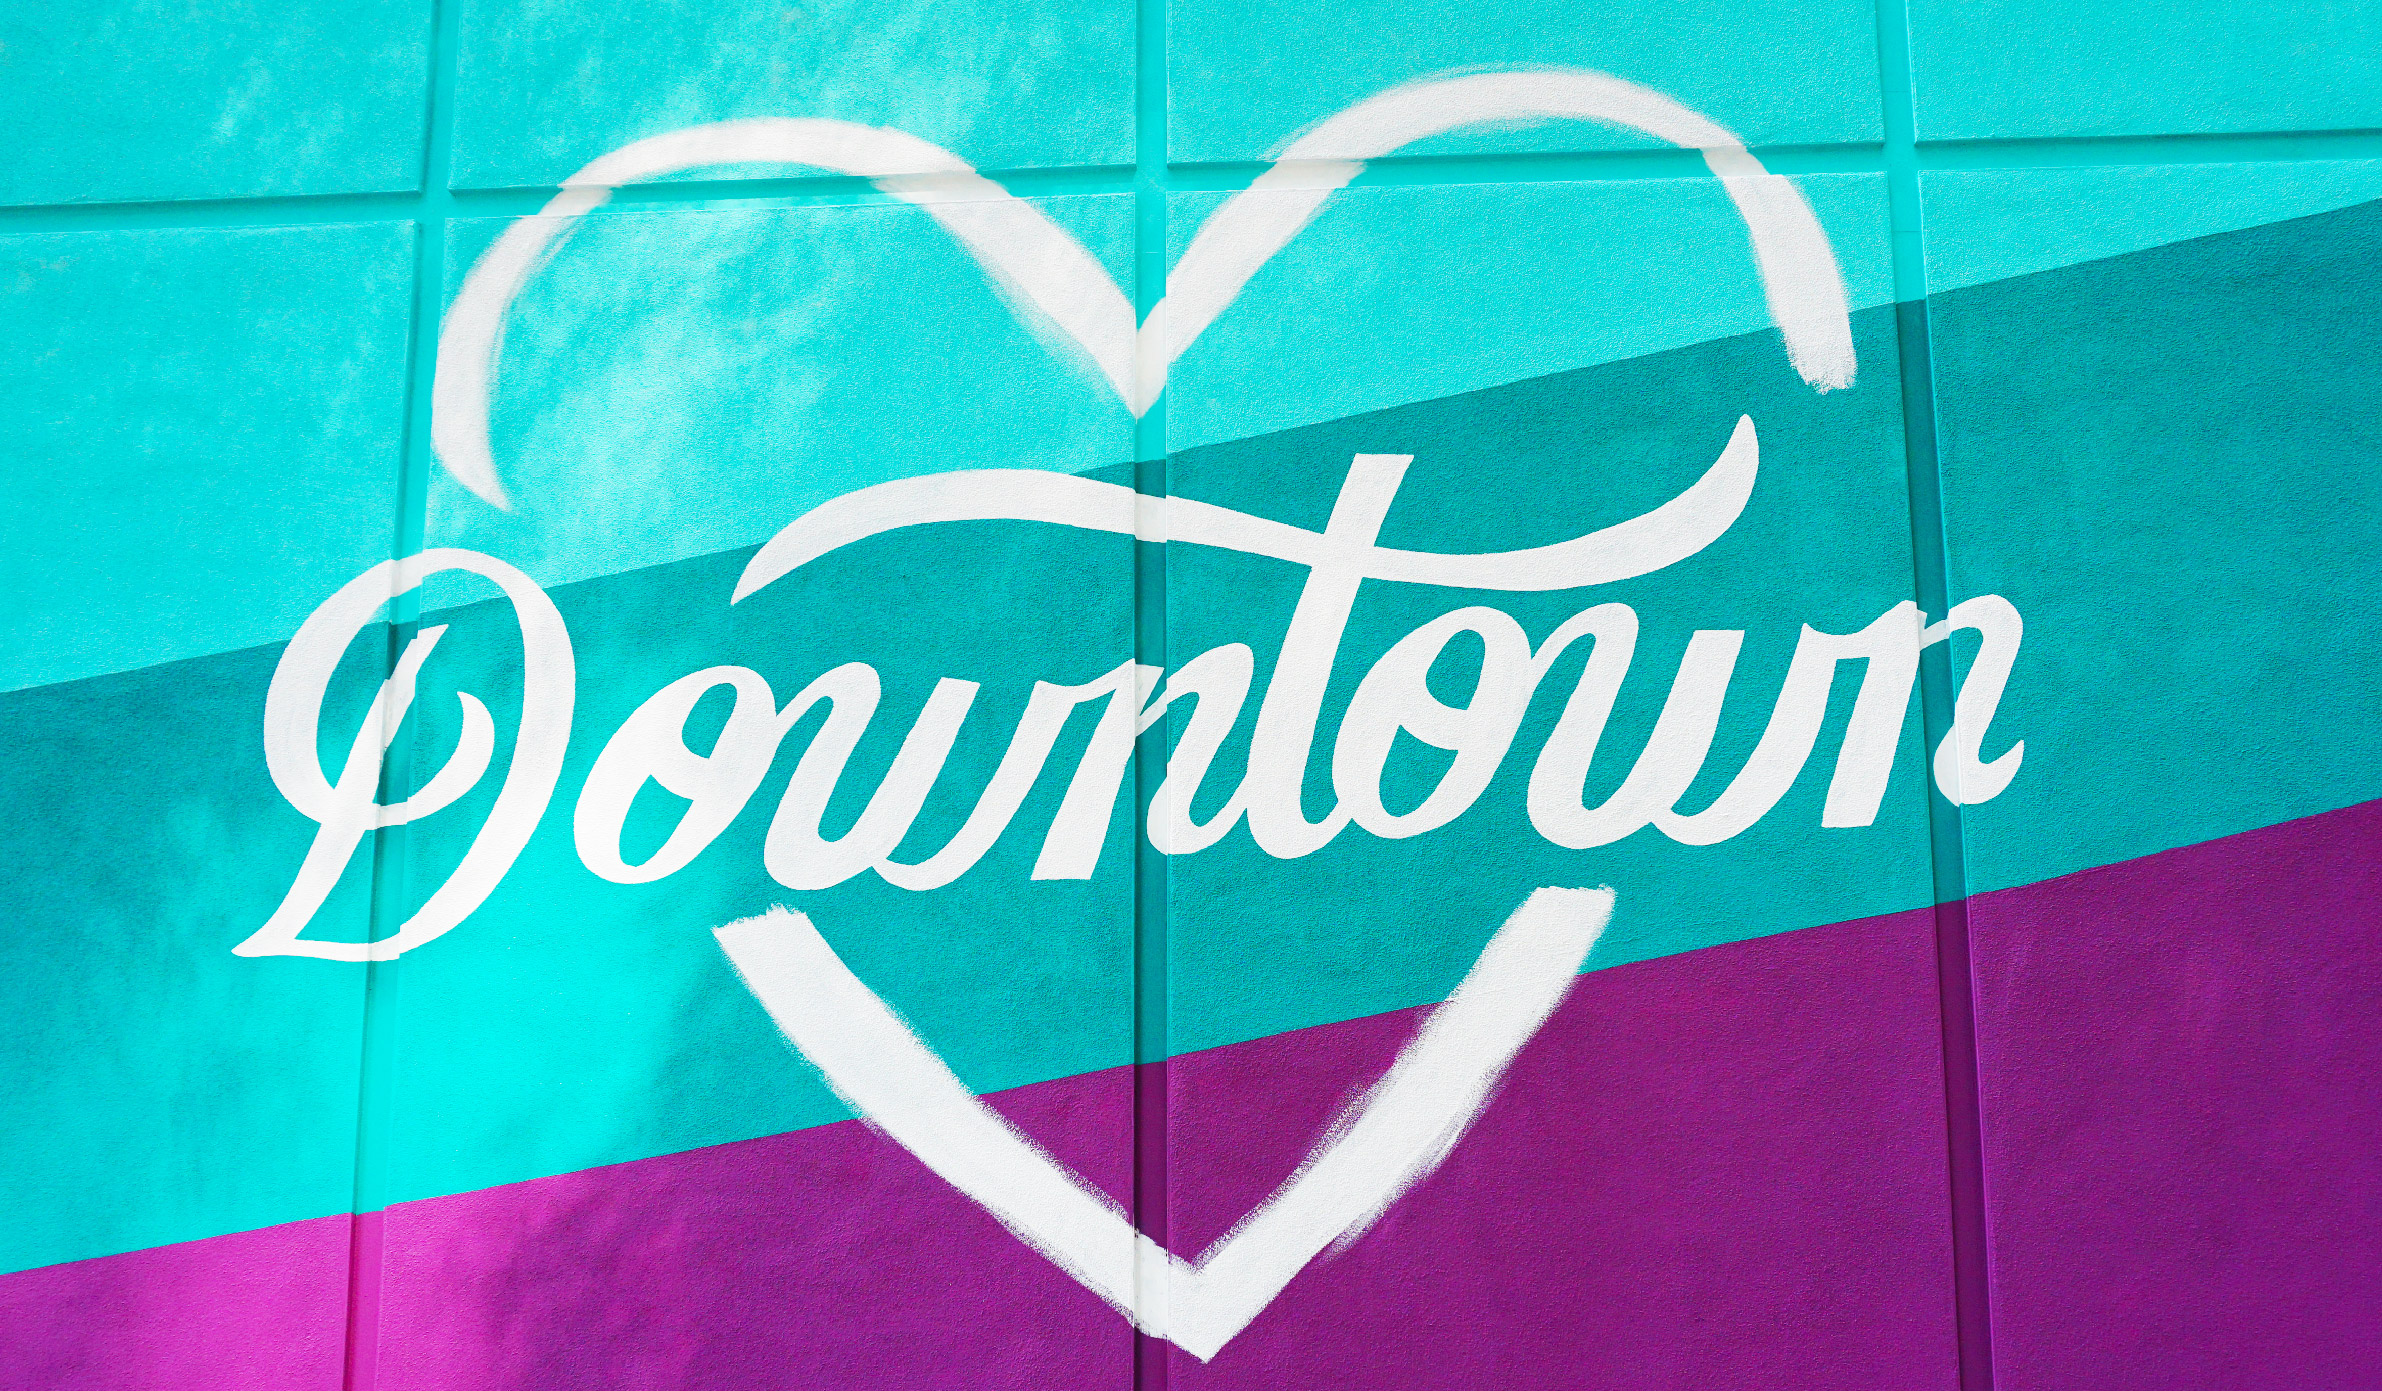 downtownmural-1-01.jpg